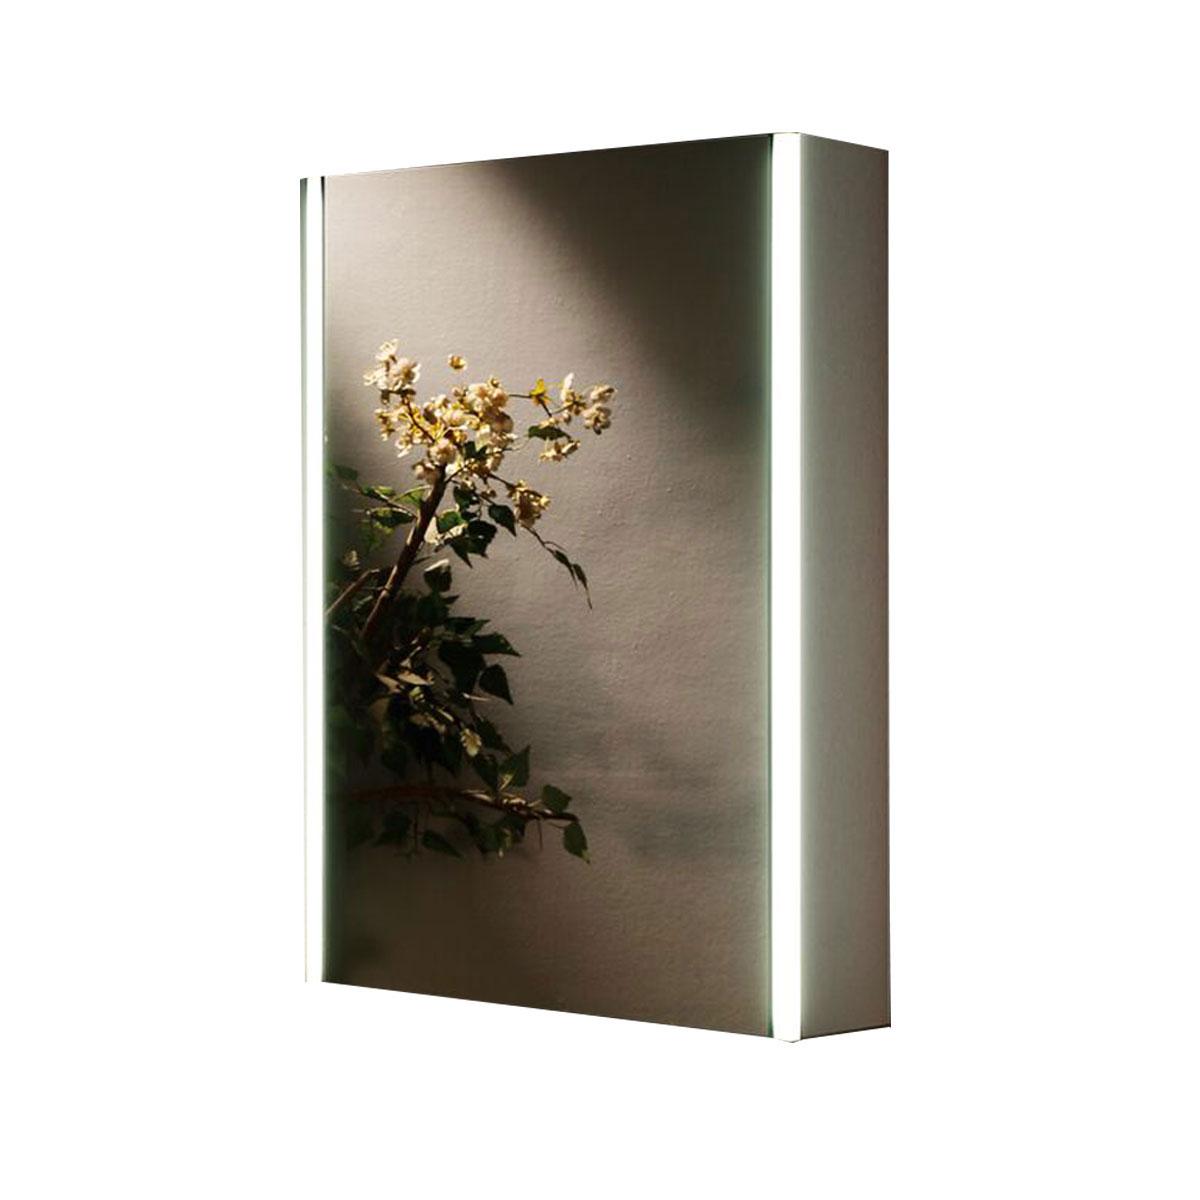 Emerald led backlit mirrored bathroom cabinet bluetooth for Bathroom cabinets 70cm wide